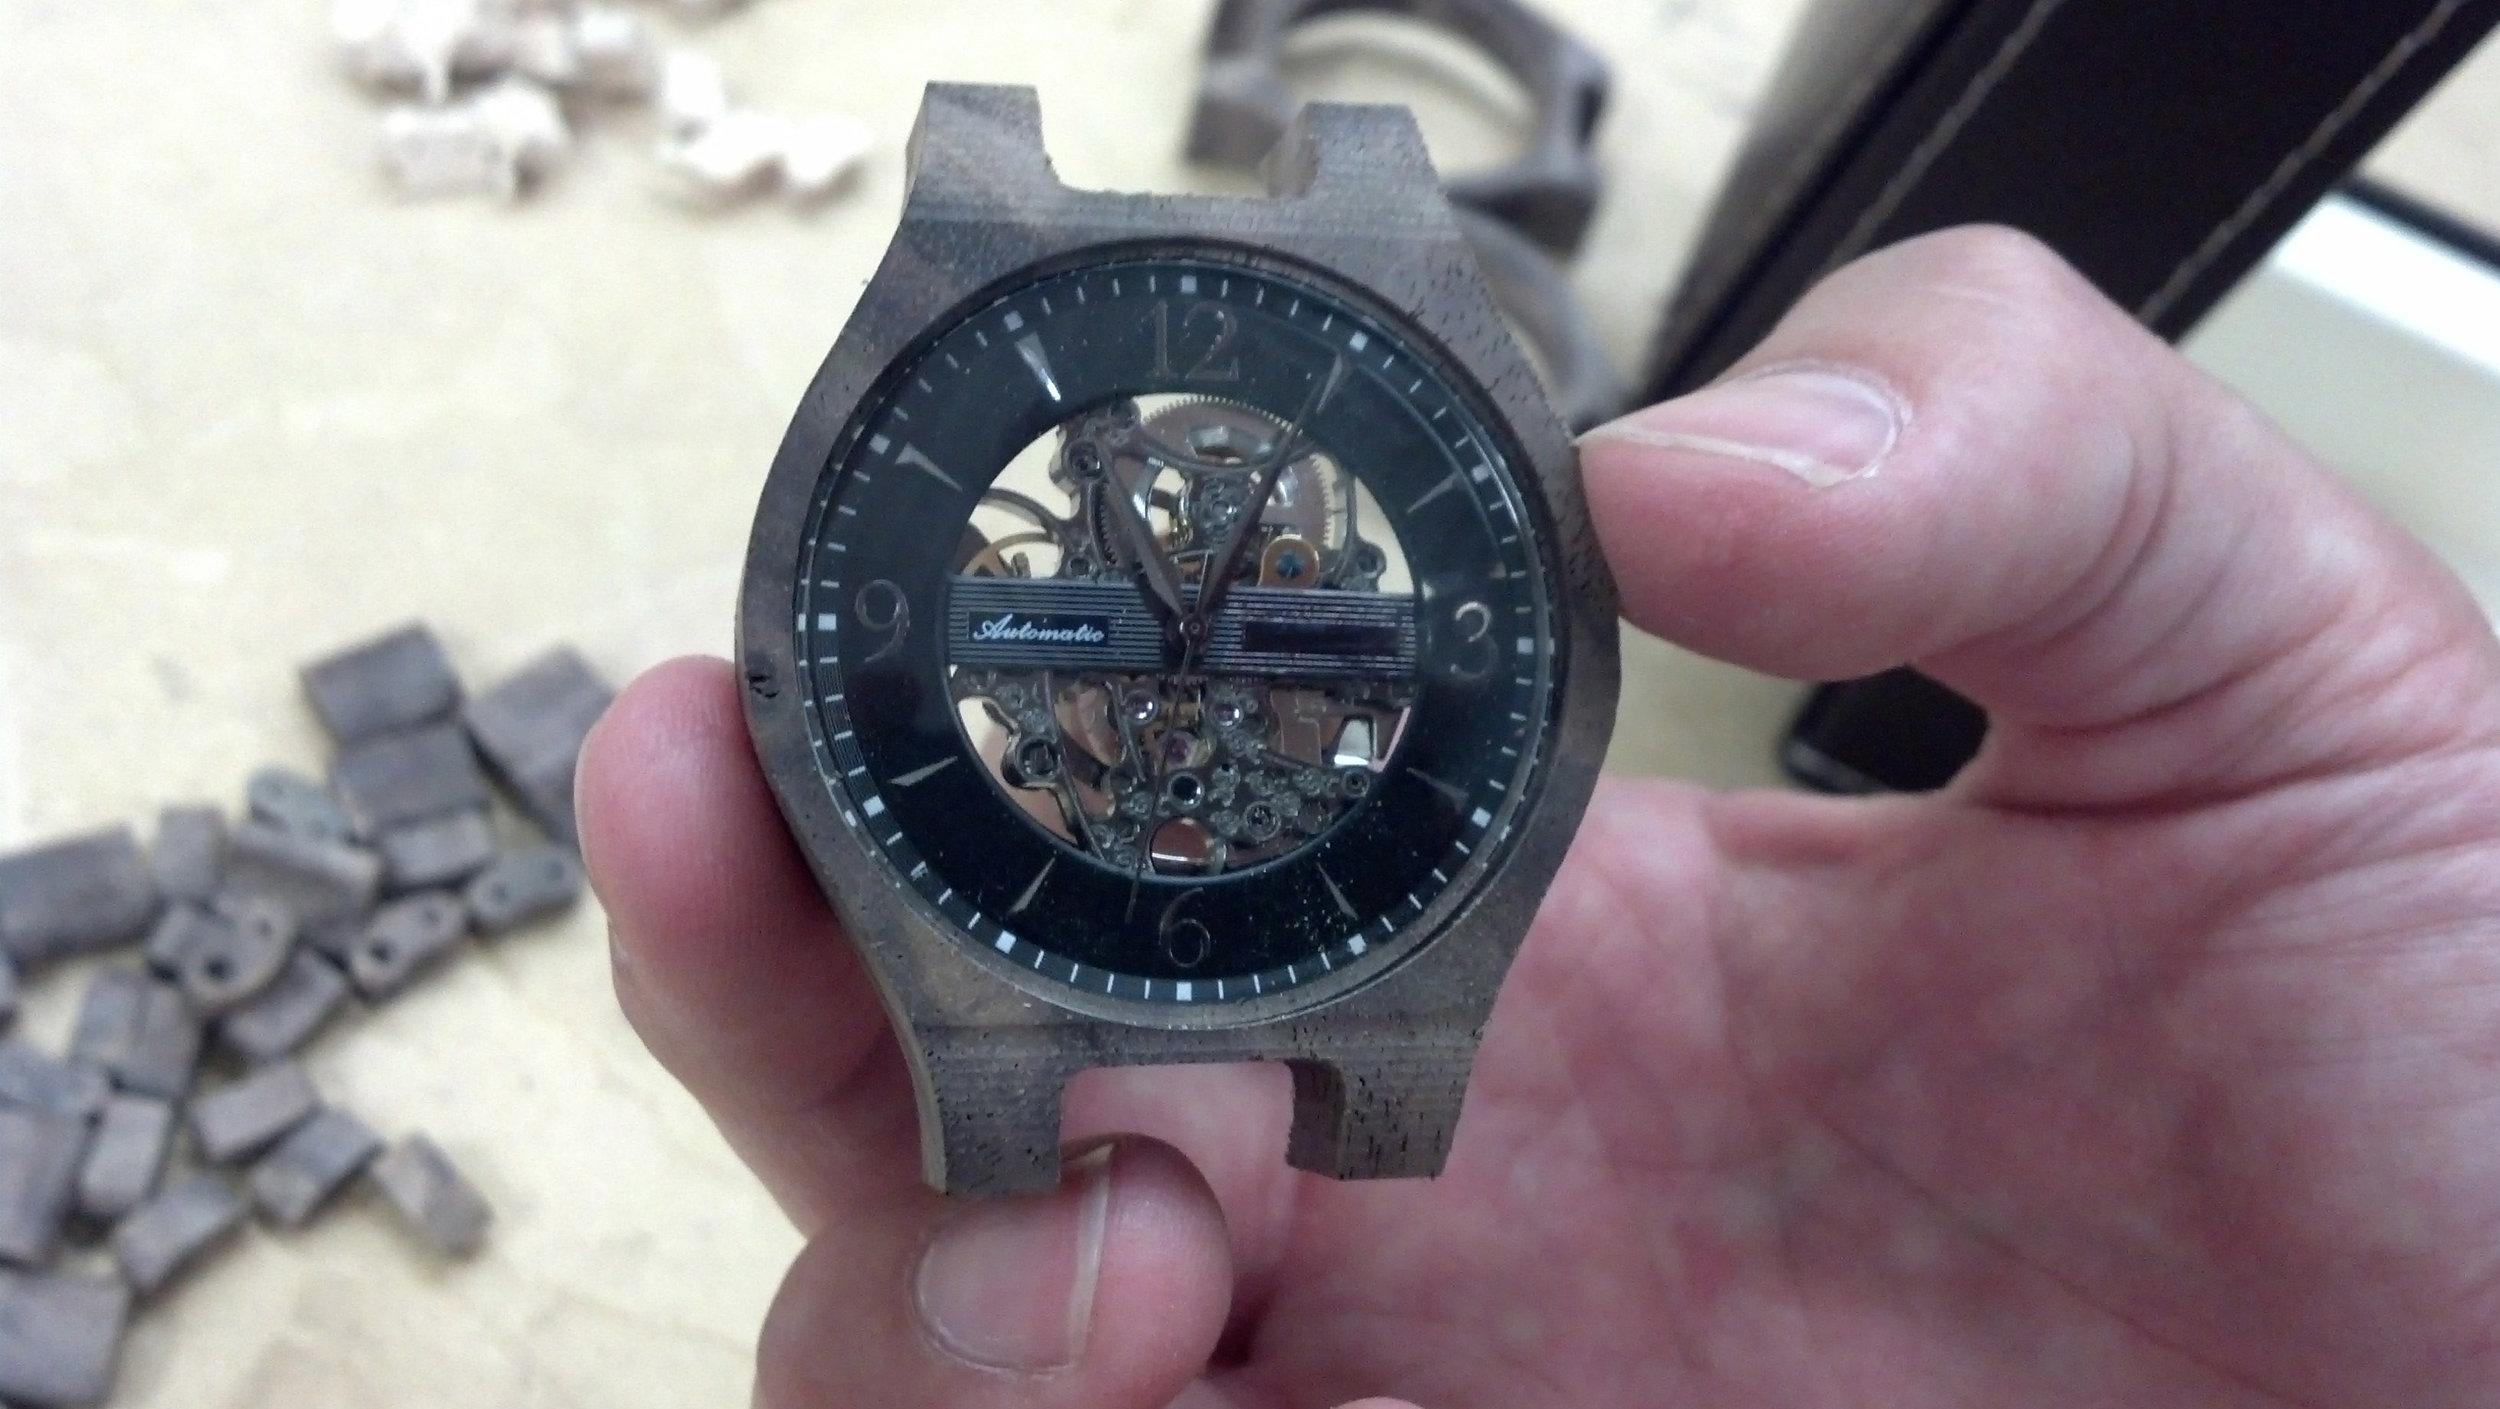 Wood watch prototype